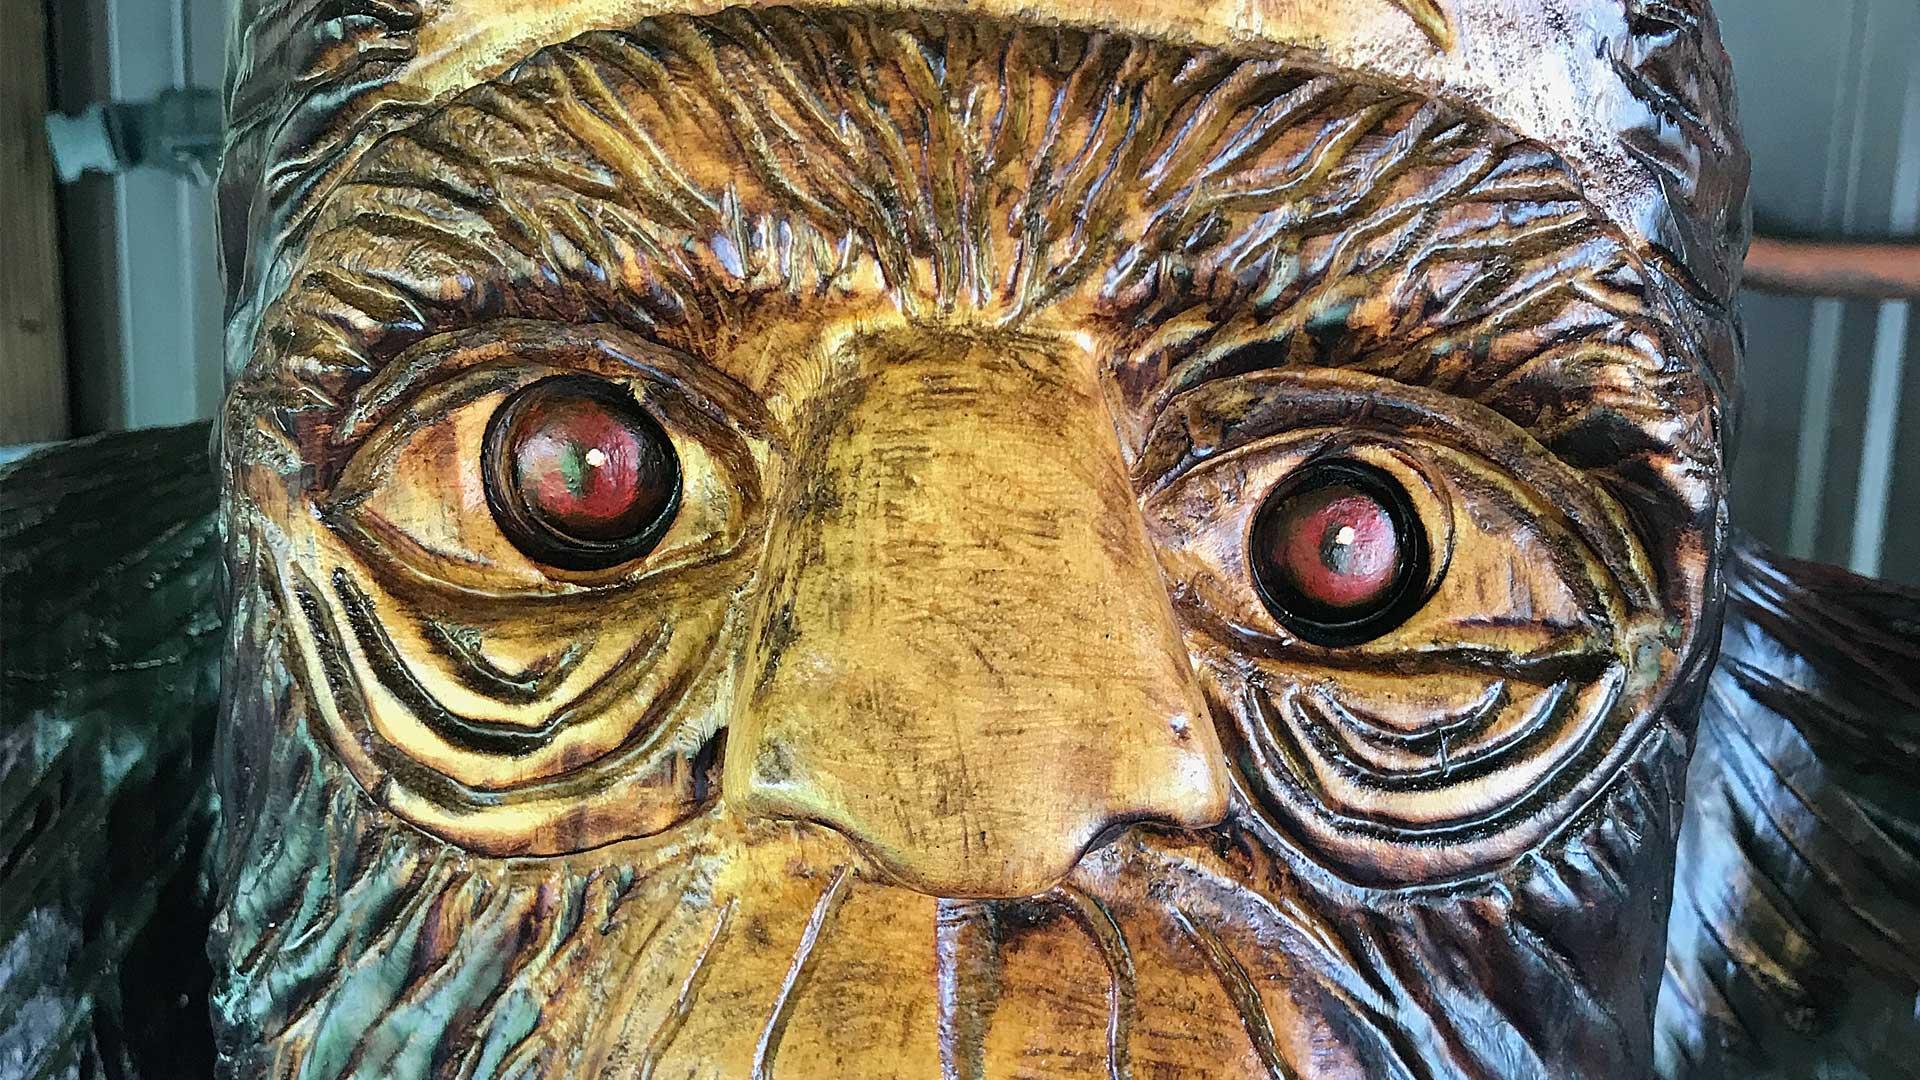 Wood carving of Bigfoot